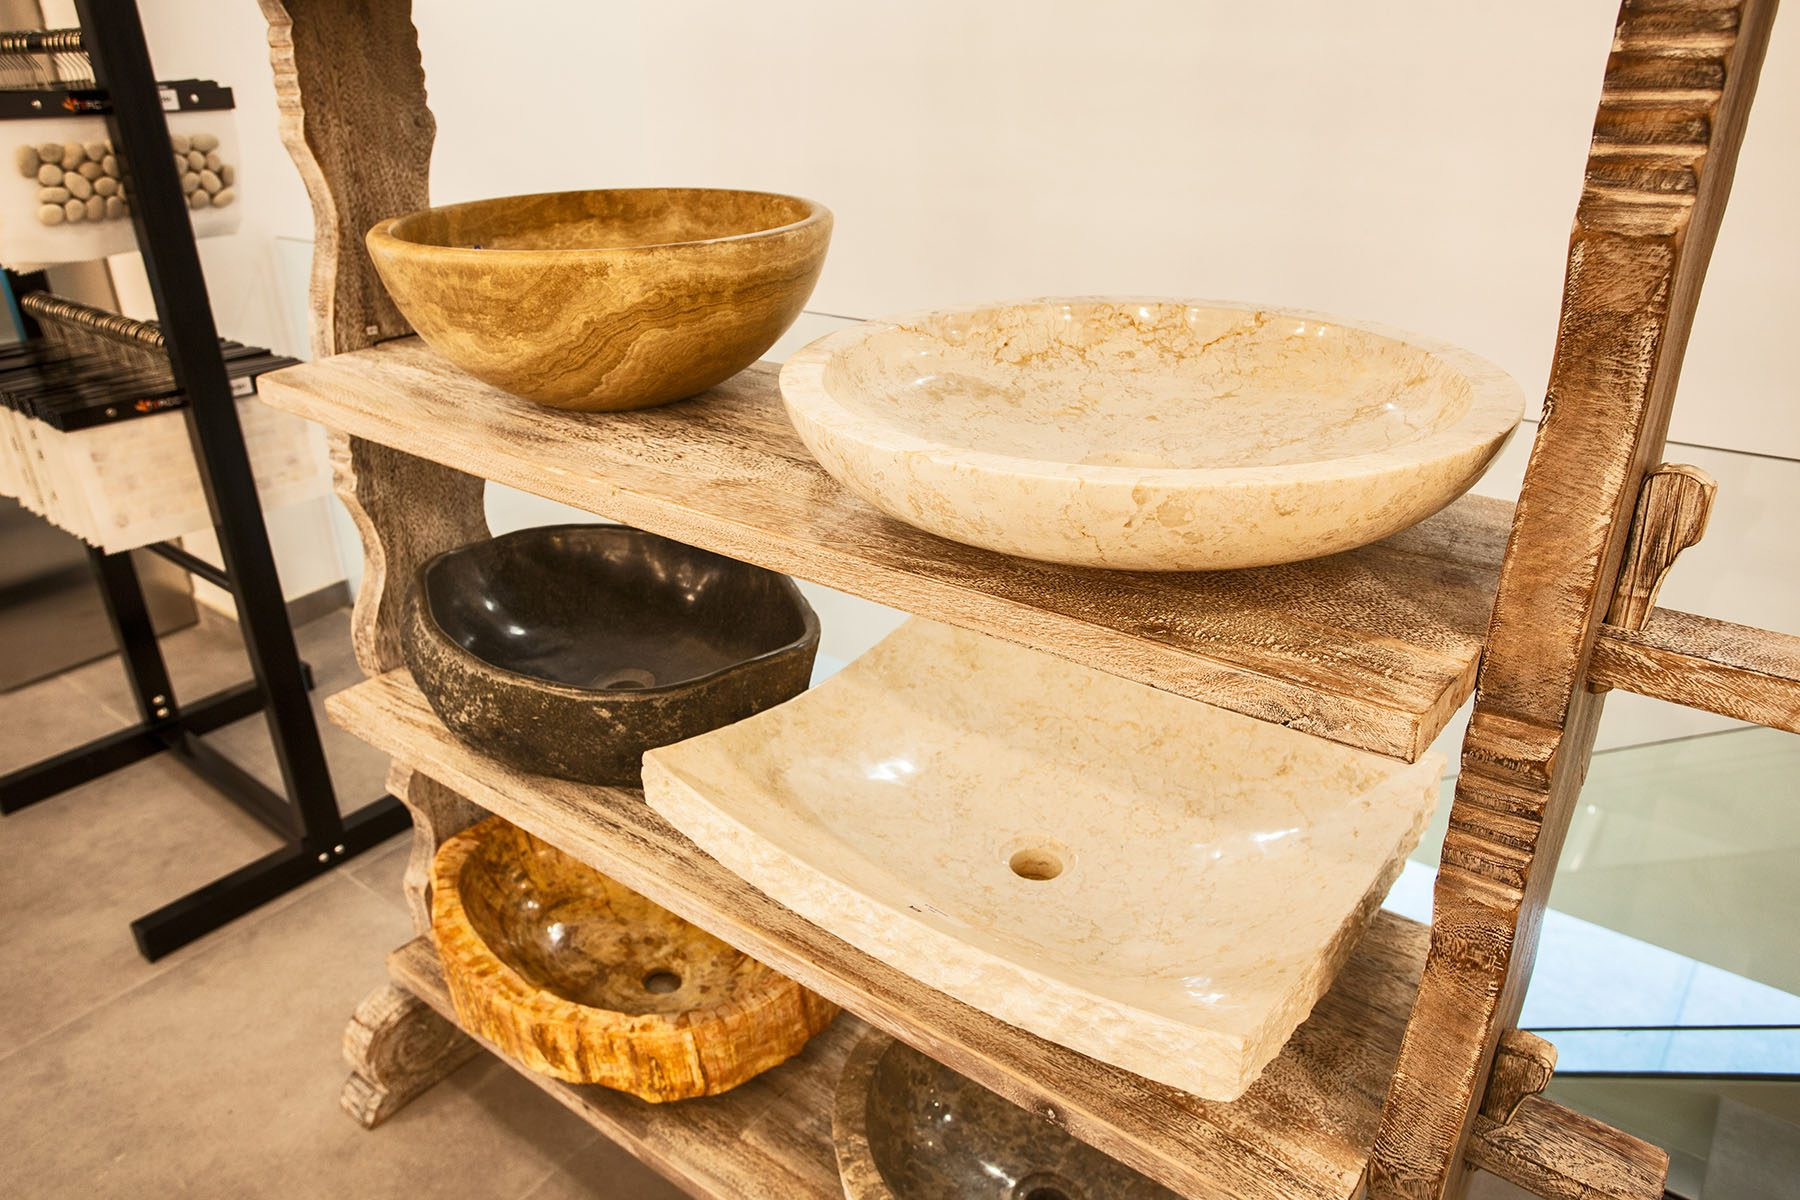 Terracotta Piedra Natural Mosaico Y Lavamanos Imagal Ceramicas